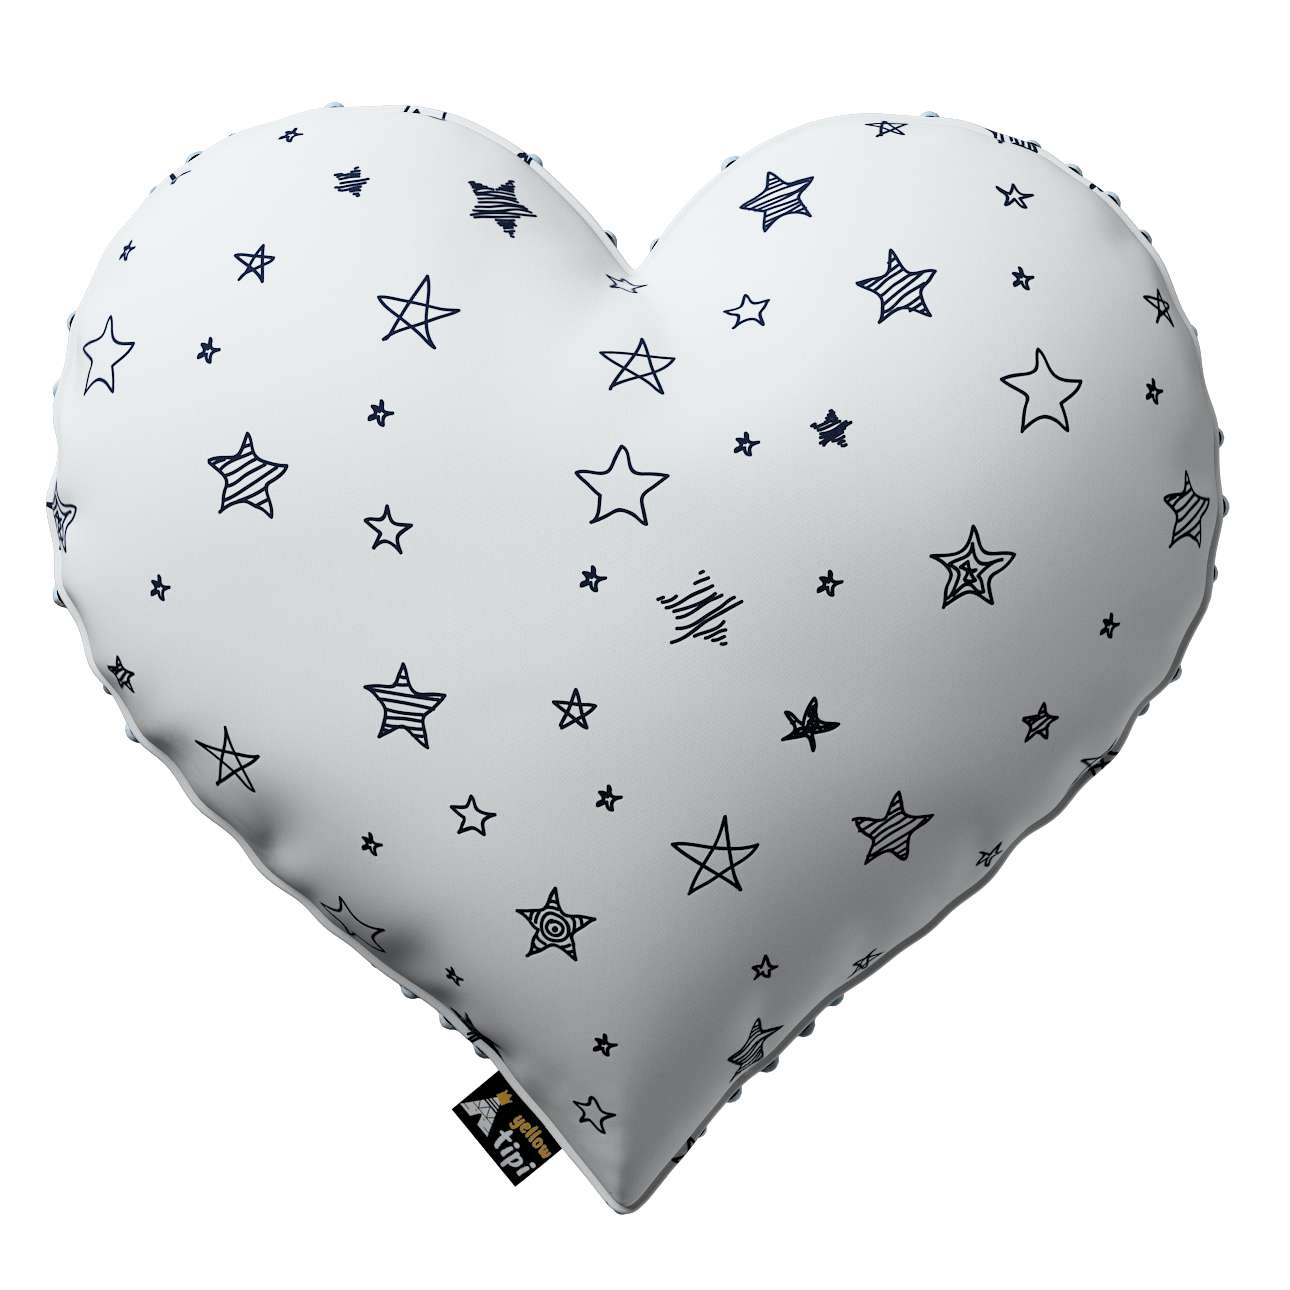 Heart of Love pagalvėlė kolekcijoje Magic Collection, audinys: 500-08